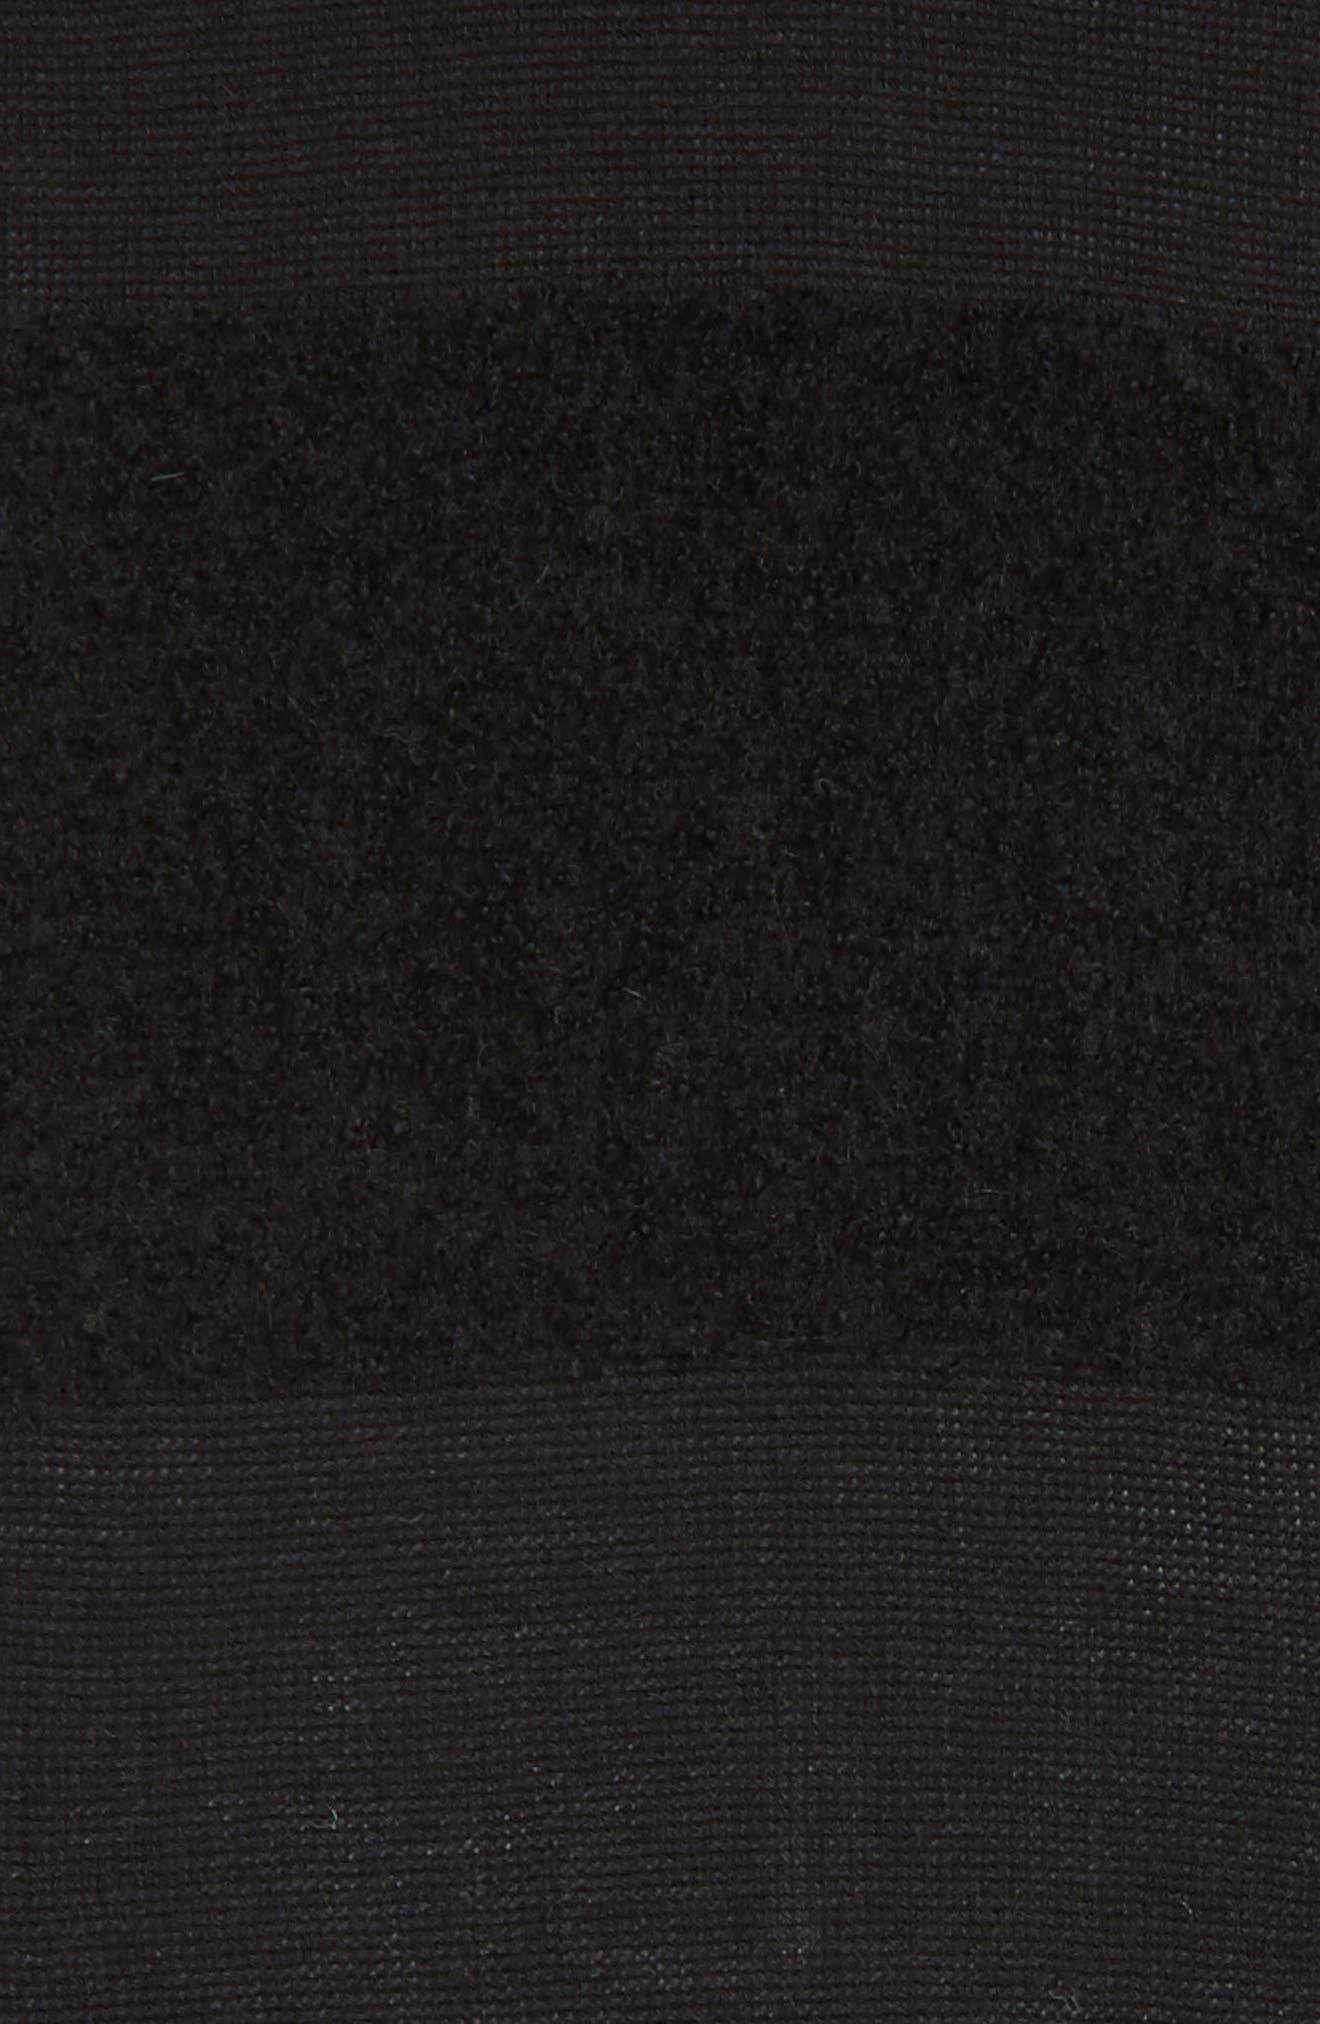 Hudson Alpaca Scarf,                             Alternate thumbnail 4, color,                             Black